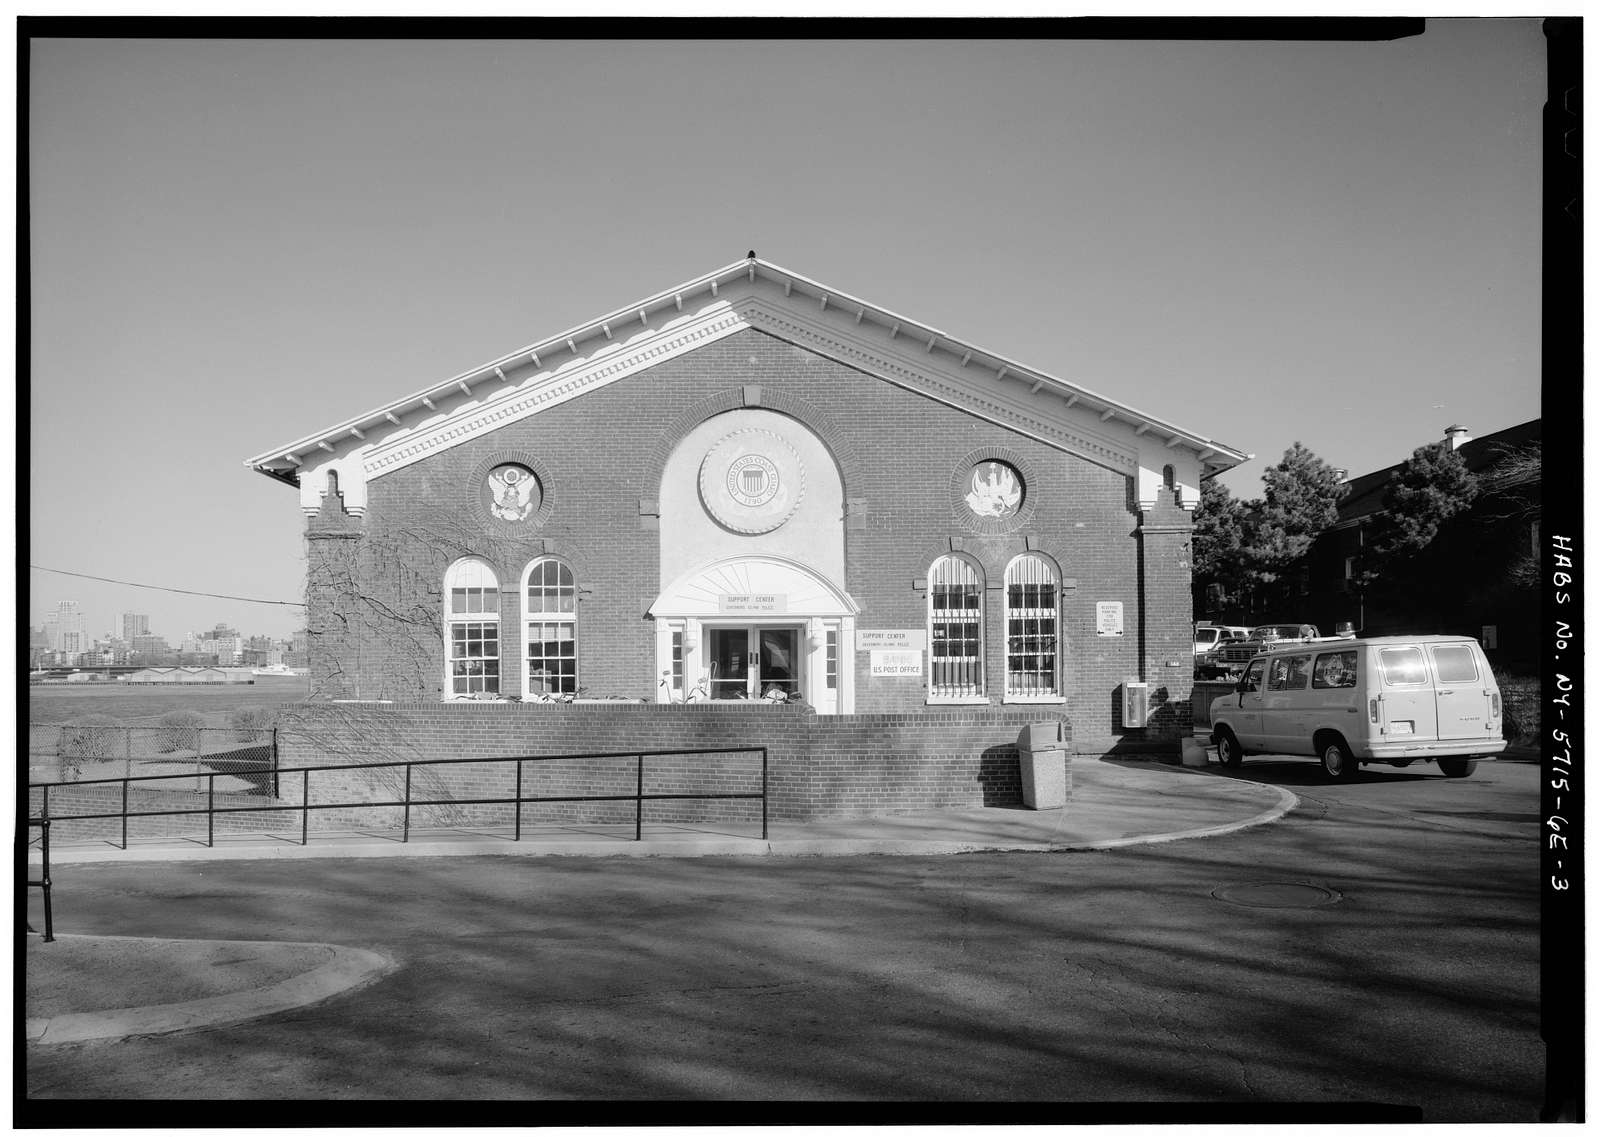 Governors Island, New York Arsenal, Storehouse, New York Harbor near Carder Road, New York, New York County, NY